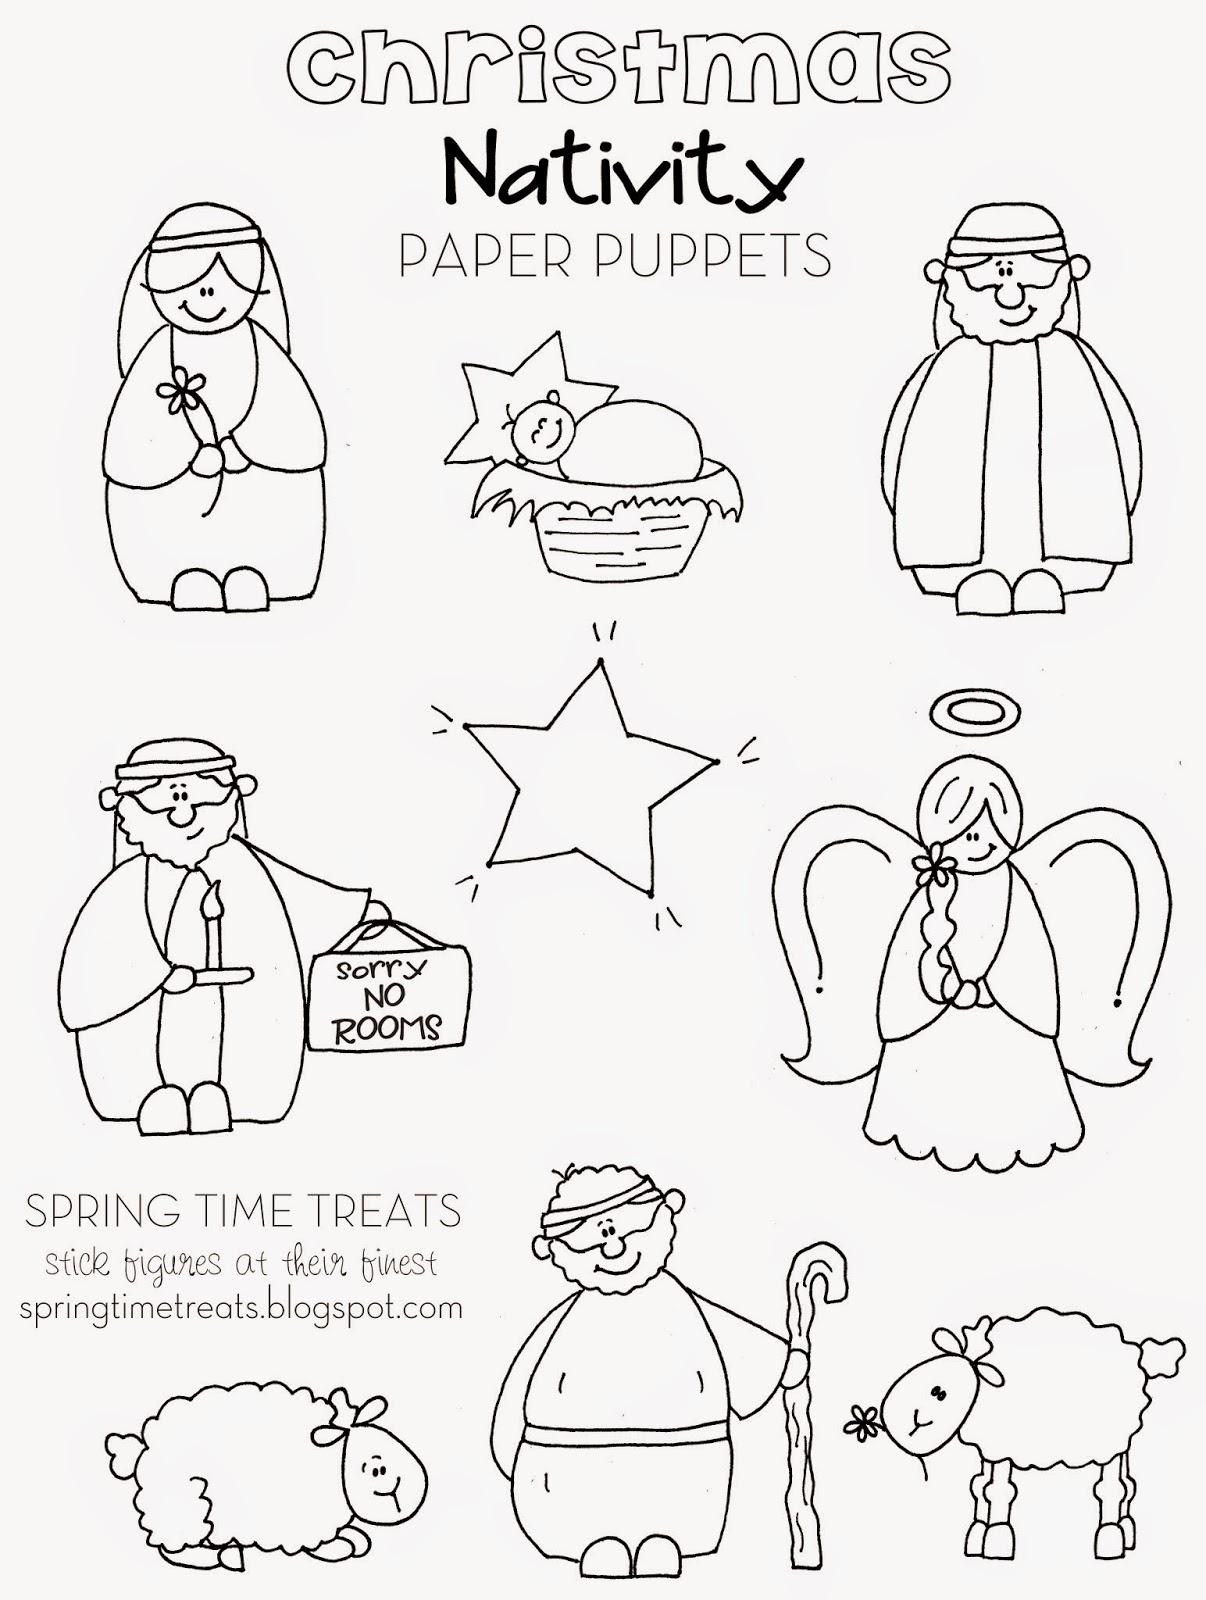 Nativity Paper Puppets